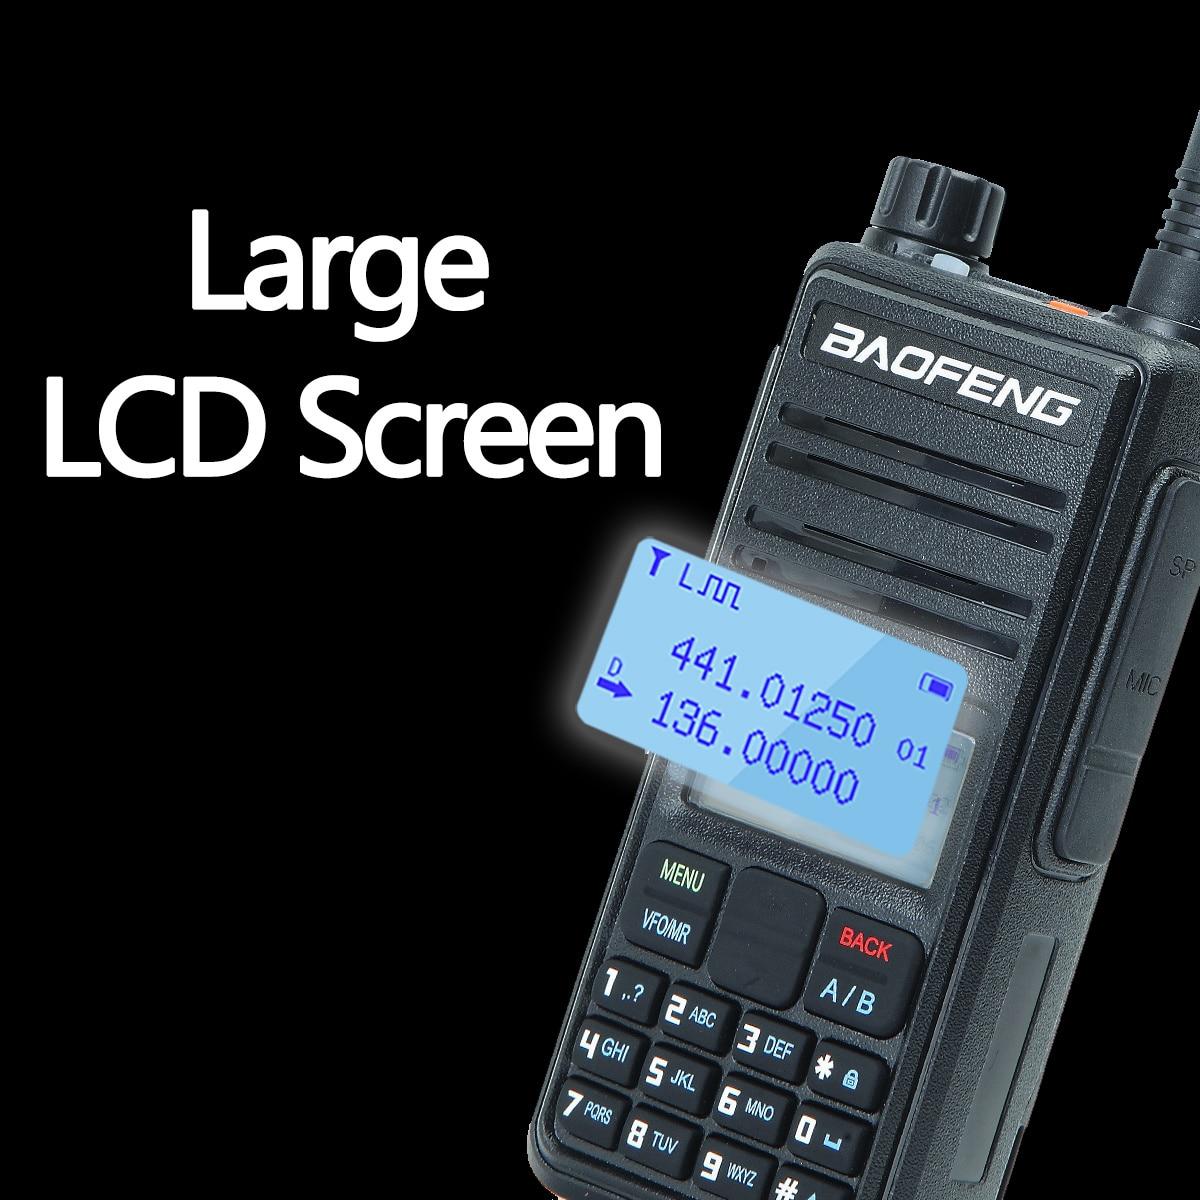 Baofeng DM-1801A Dual Time Slot DMR Tier I&II Radio Digital Analog 136-174/400-470MHz Walkie Talkie Hunting DM-5R DM-860 enlarge